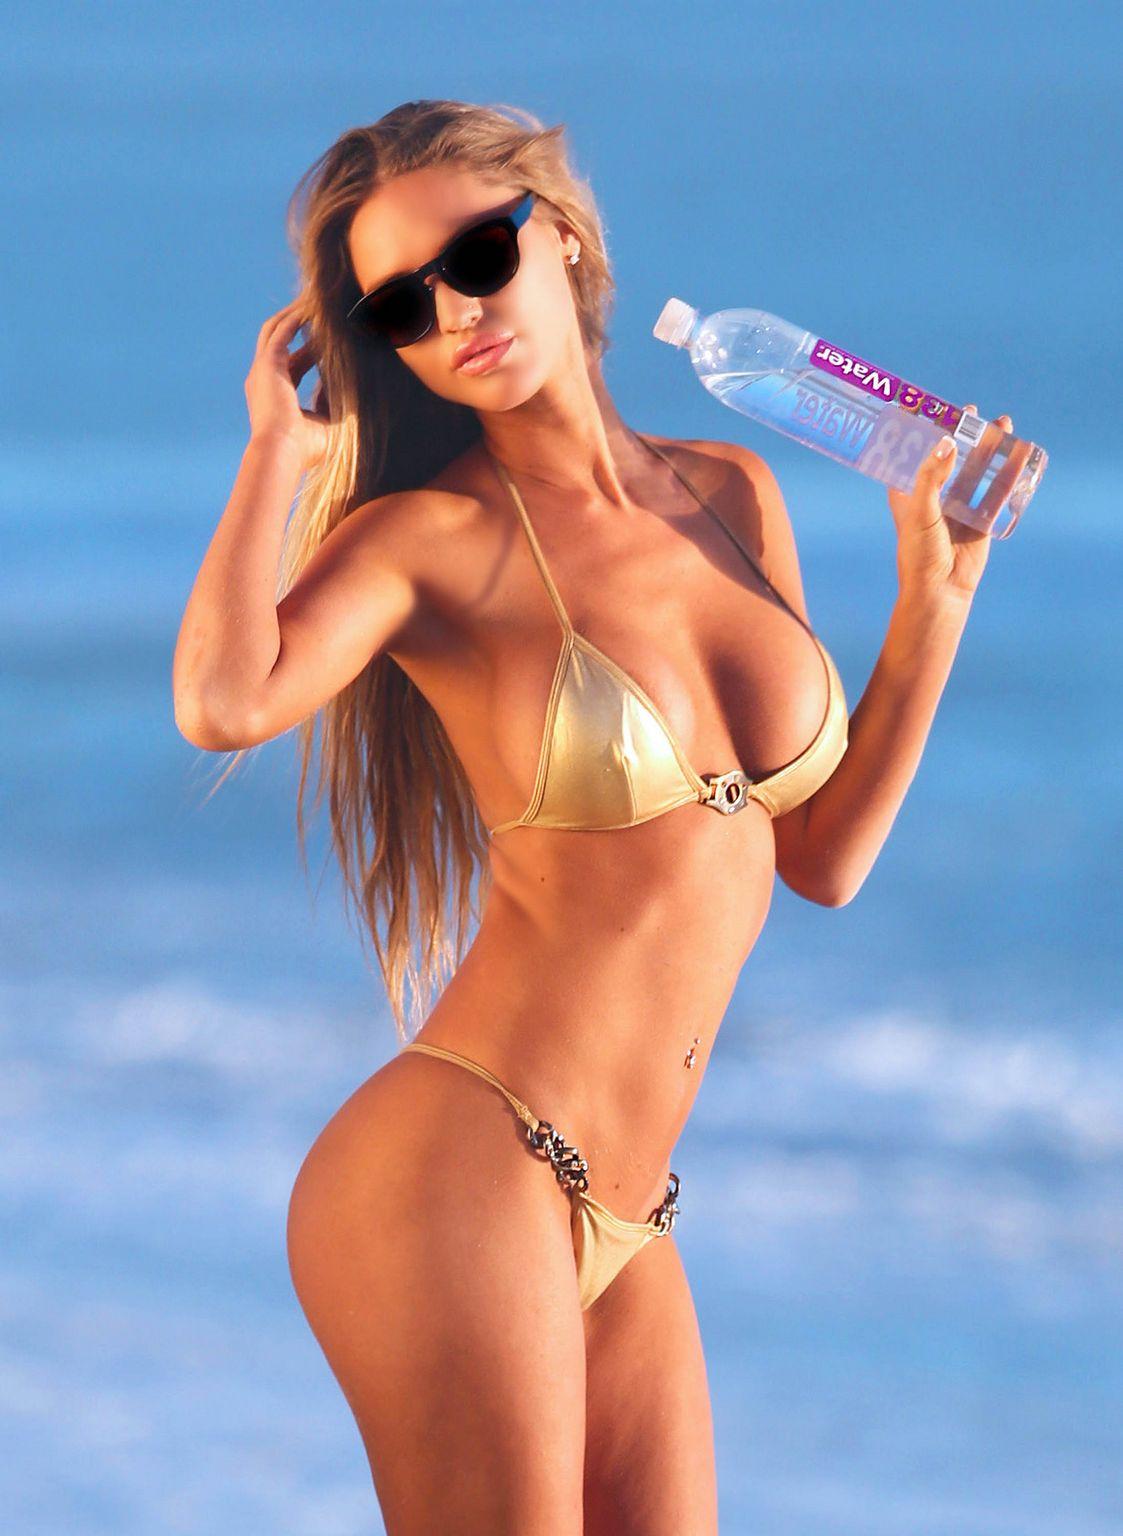 Charlie Riina Shows Off Her Bikini Body Where She Shoots For Water-3